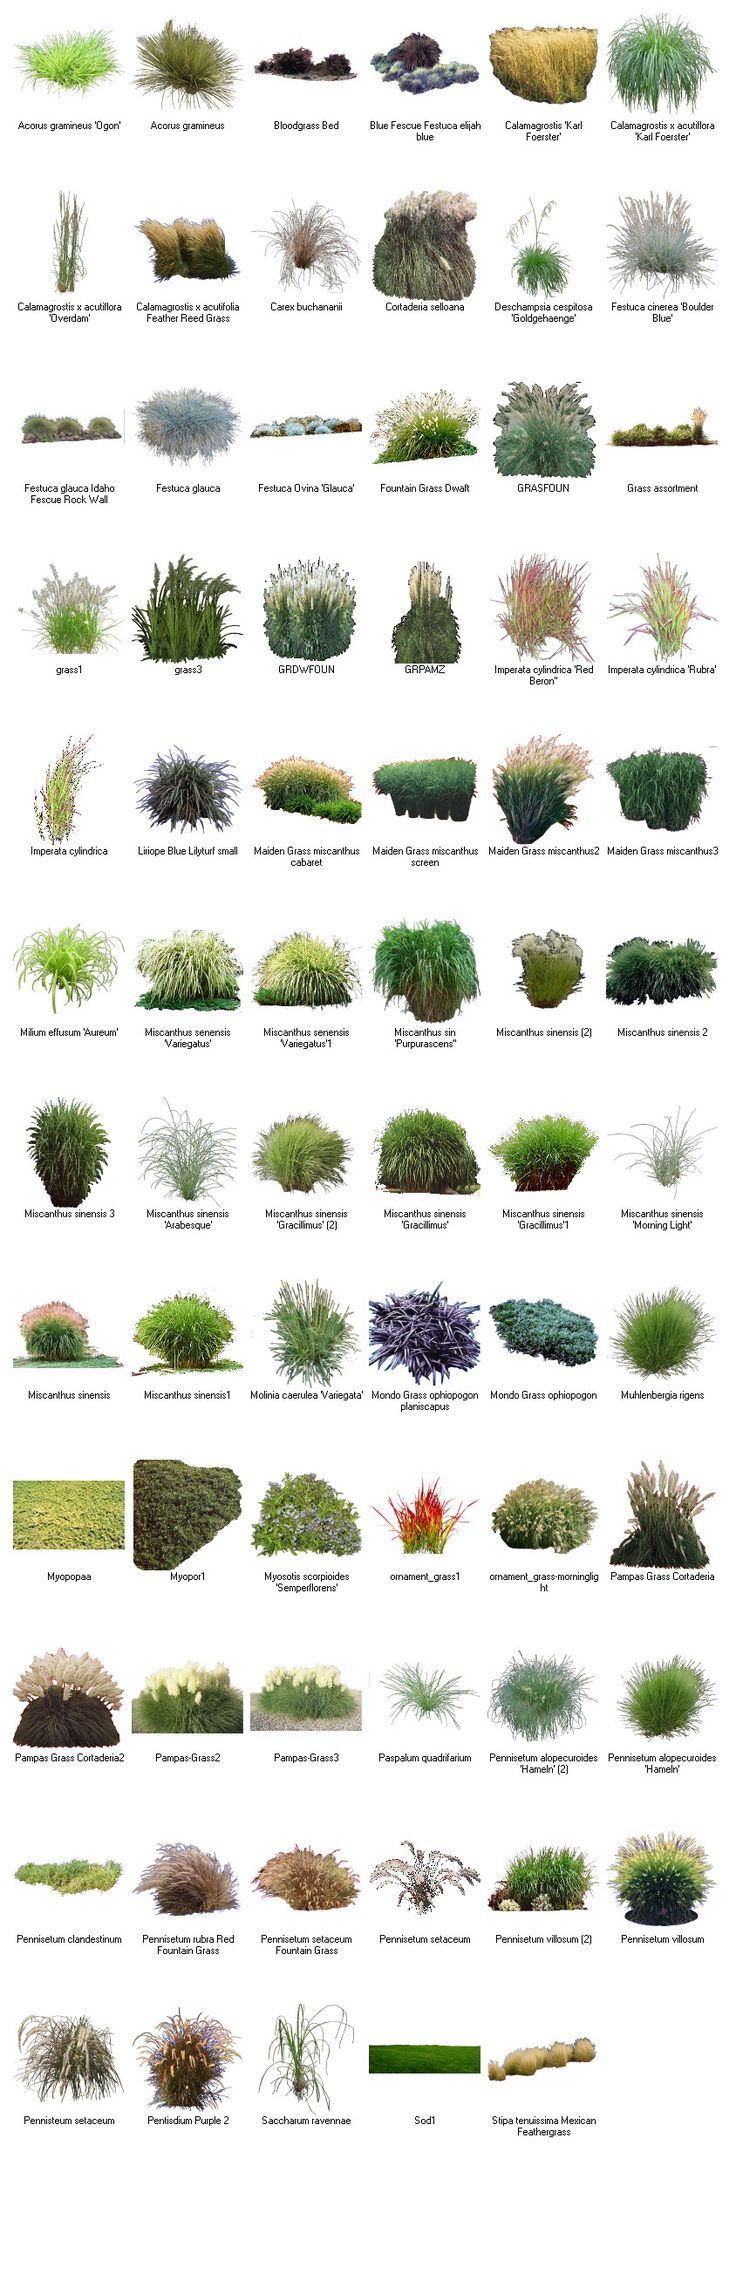 Best 25+ Landscaping software ideas on Pinterest